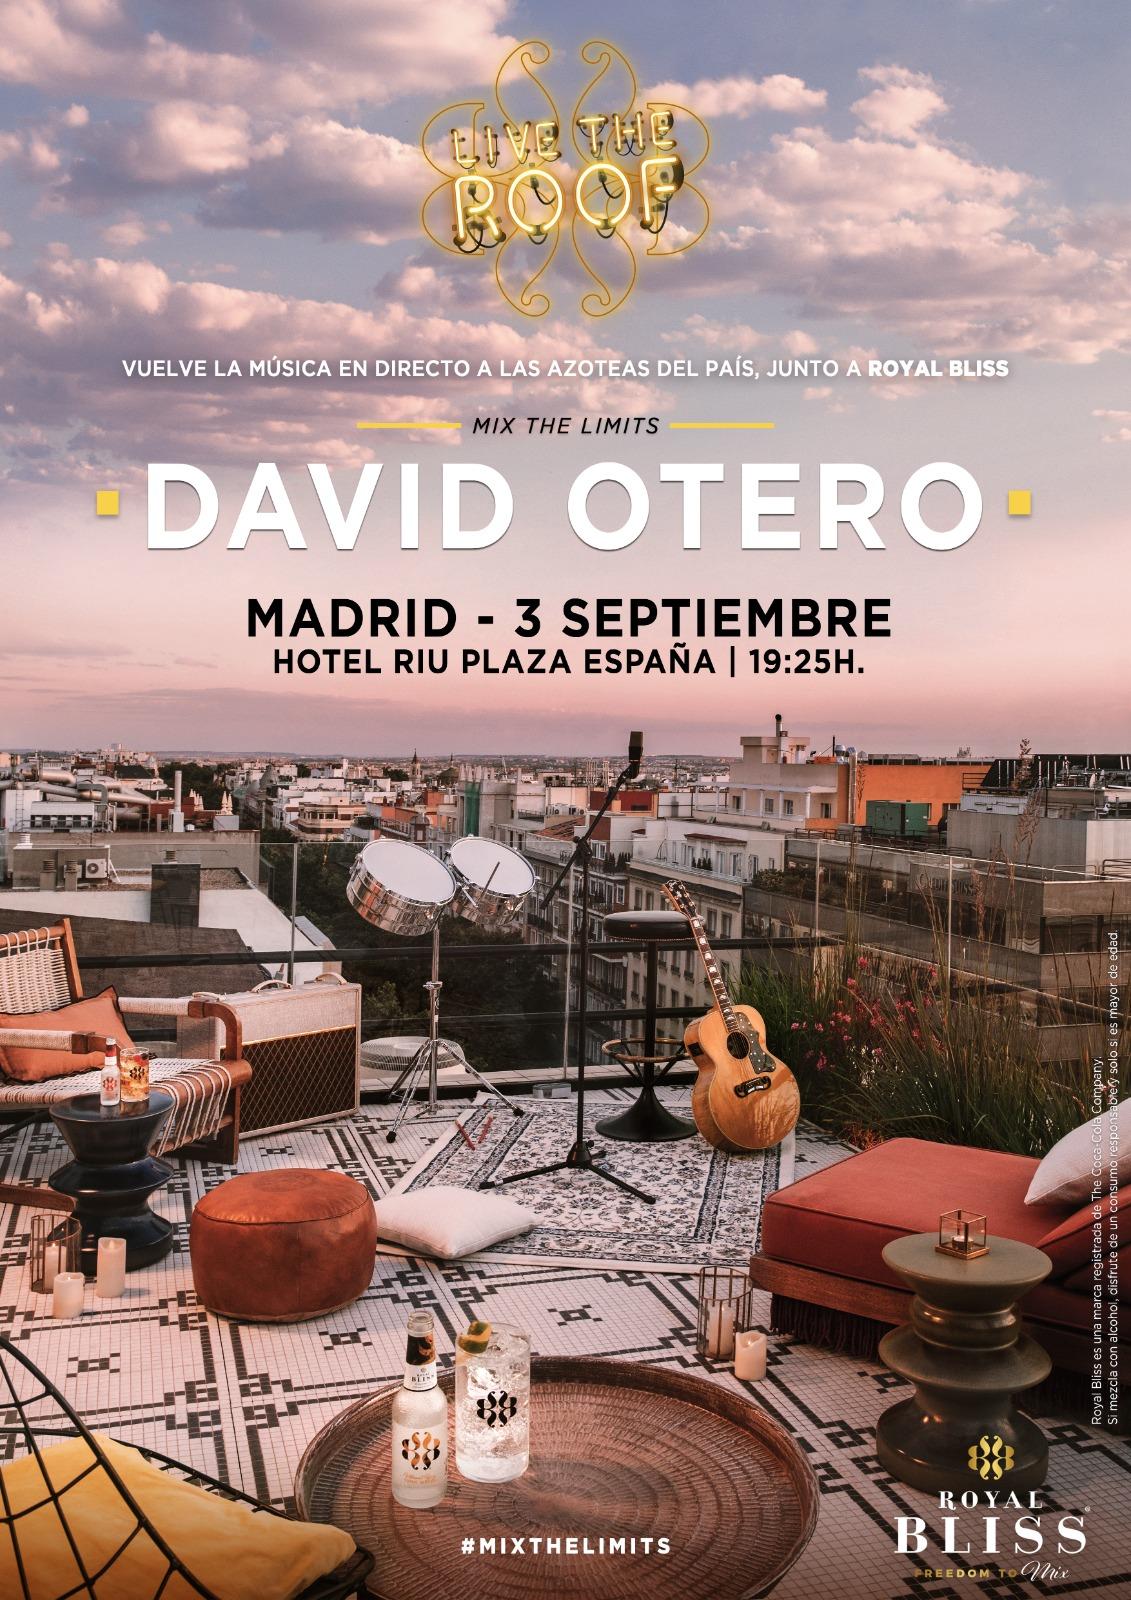 david otero en live the roof madrid 16261660834582608